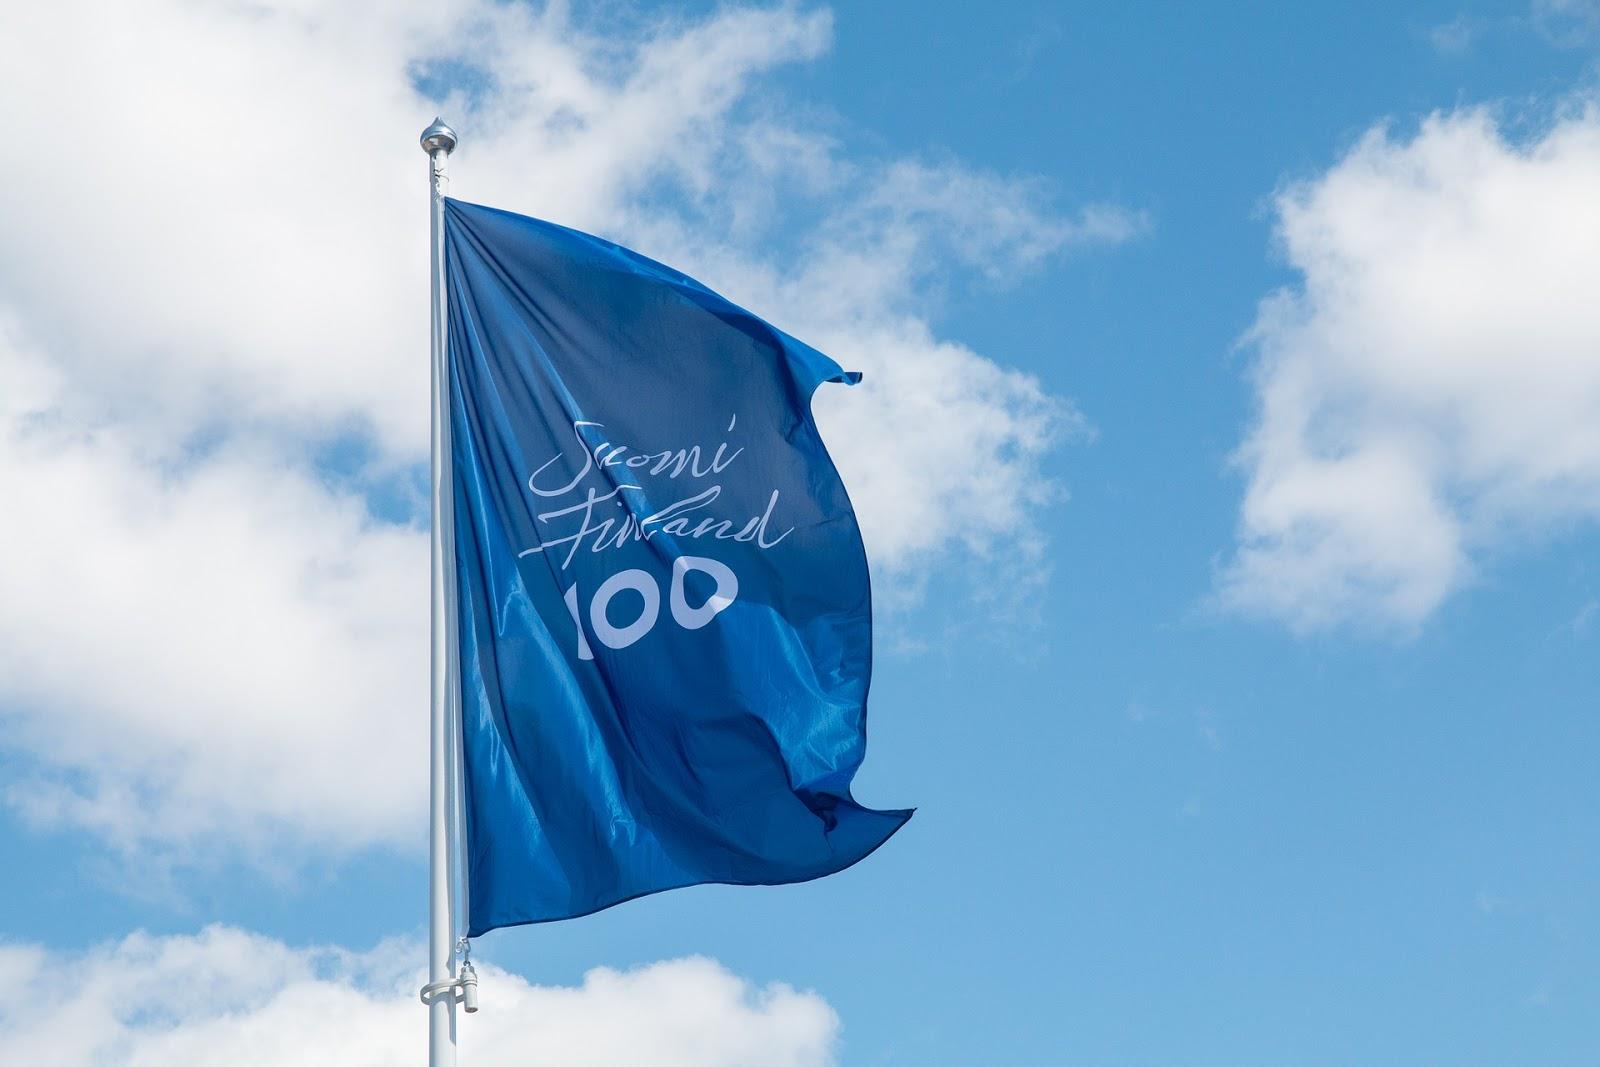 suomi 100 satavuotinen juhlavuosi Finland 100v